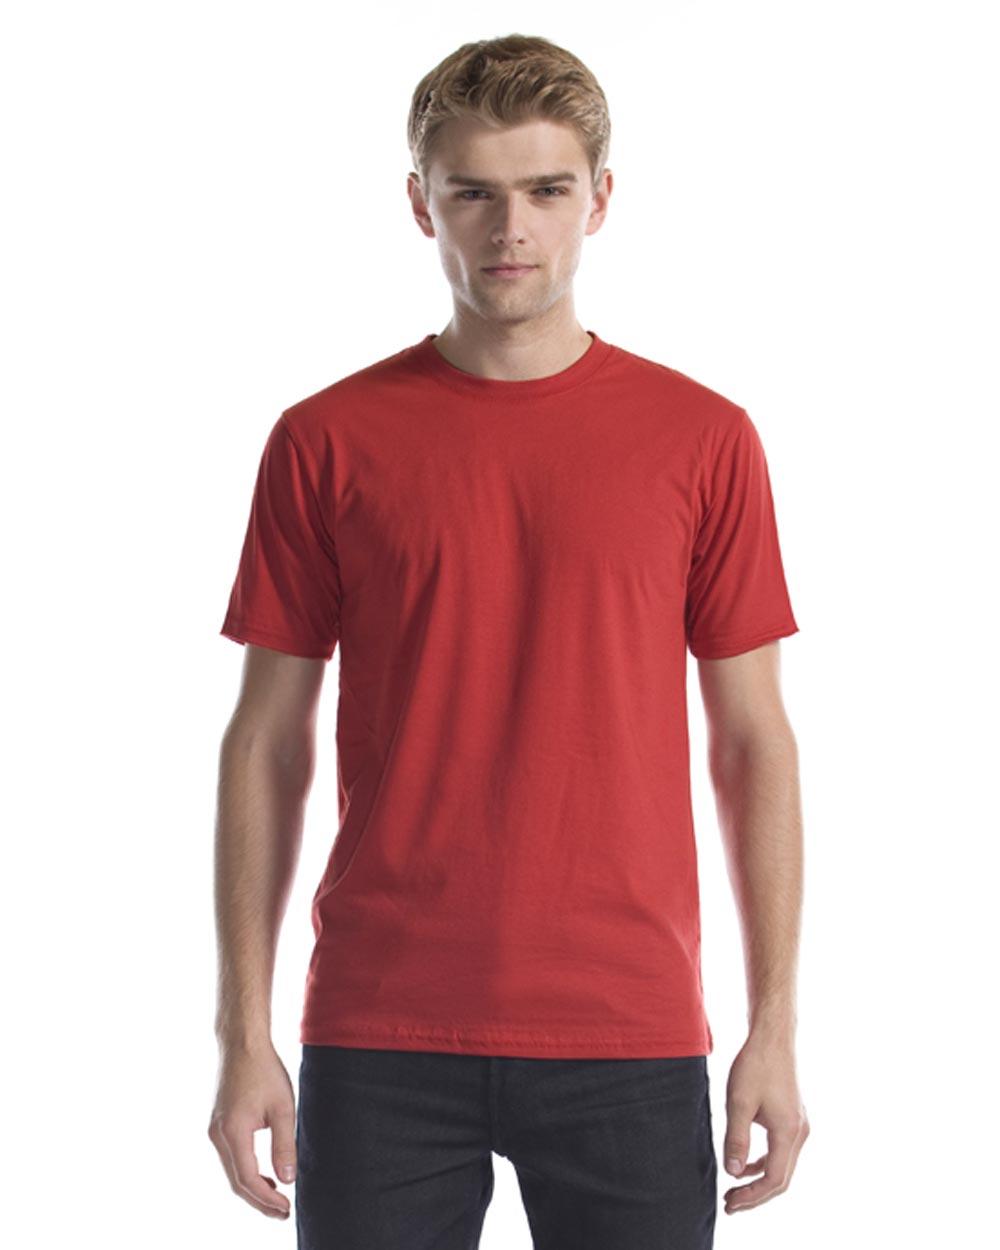 Jerico Ring Spun Cotton T-Shirt